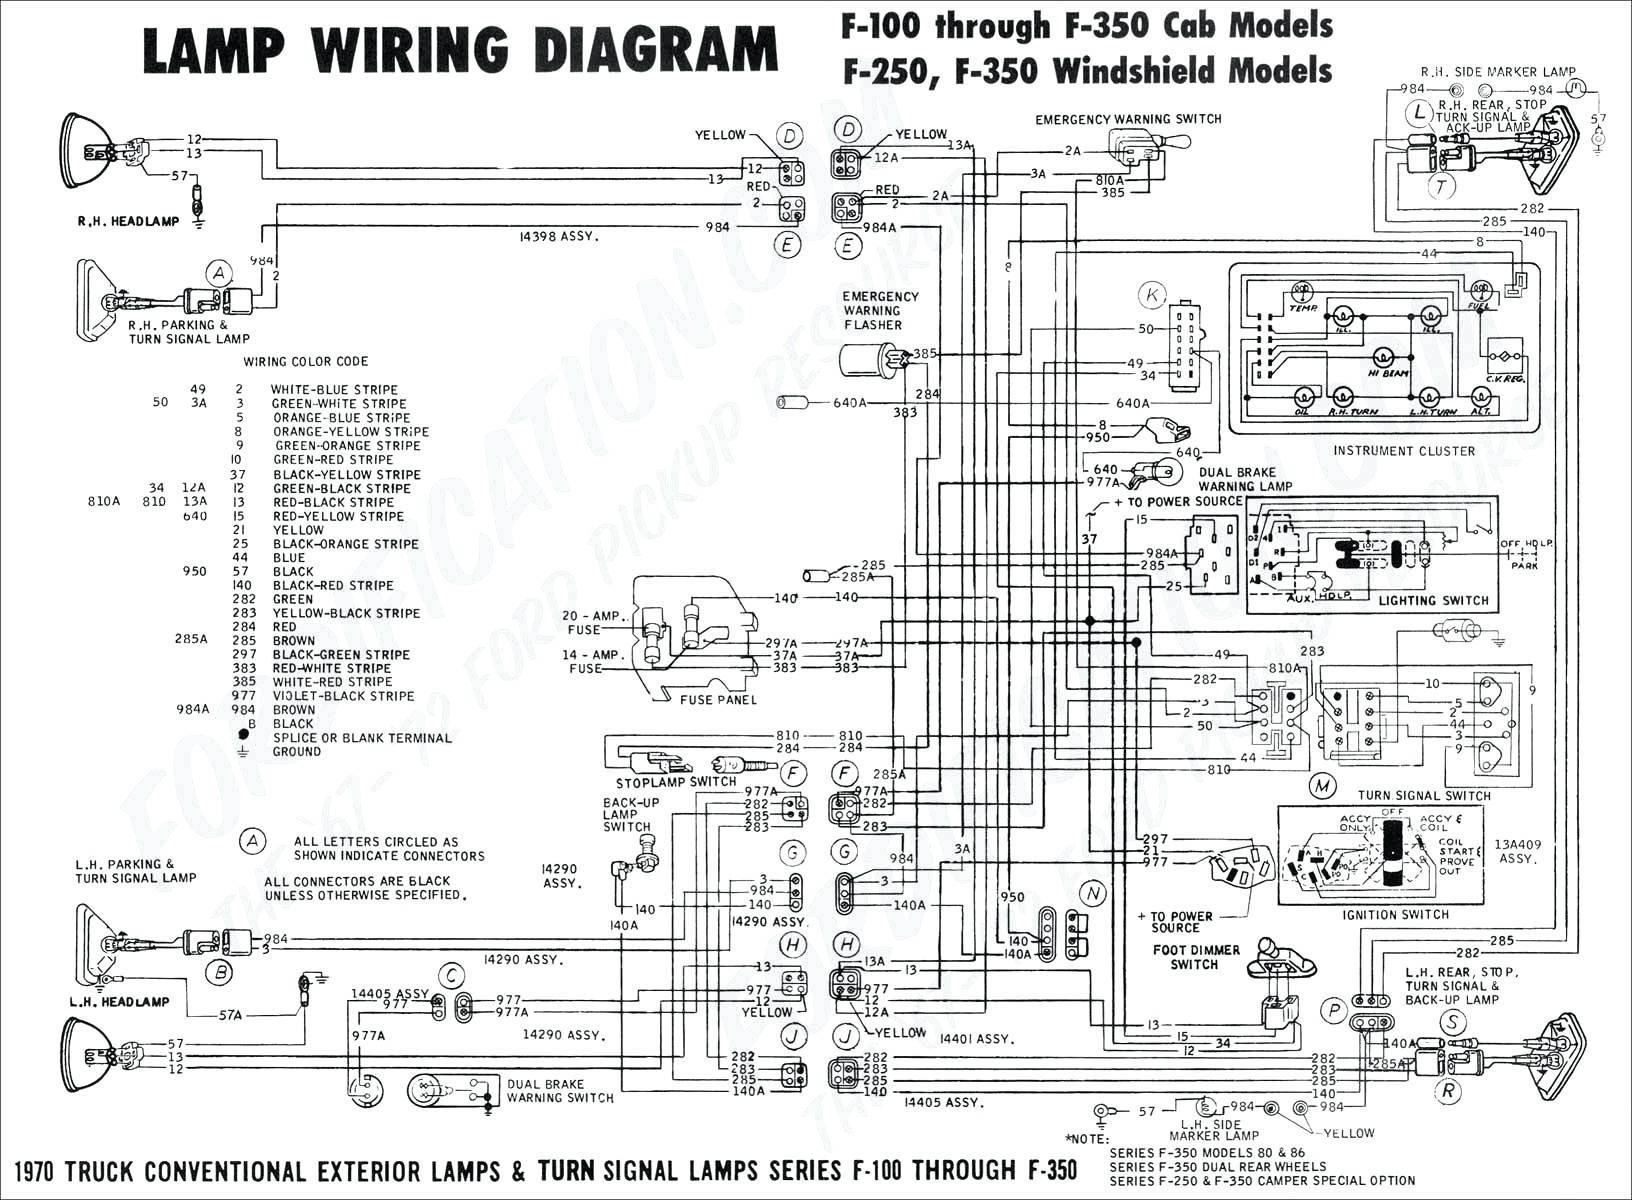 Turn Signal Diagram Light Shelf Diagram New Eugrab – Wiring Diagram Sample and Charts Of Turn Signal Diagram